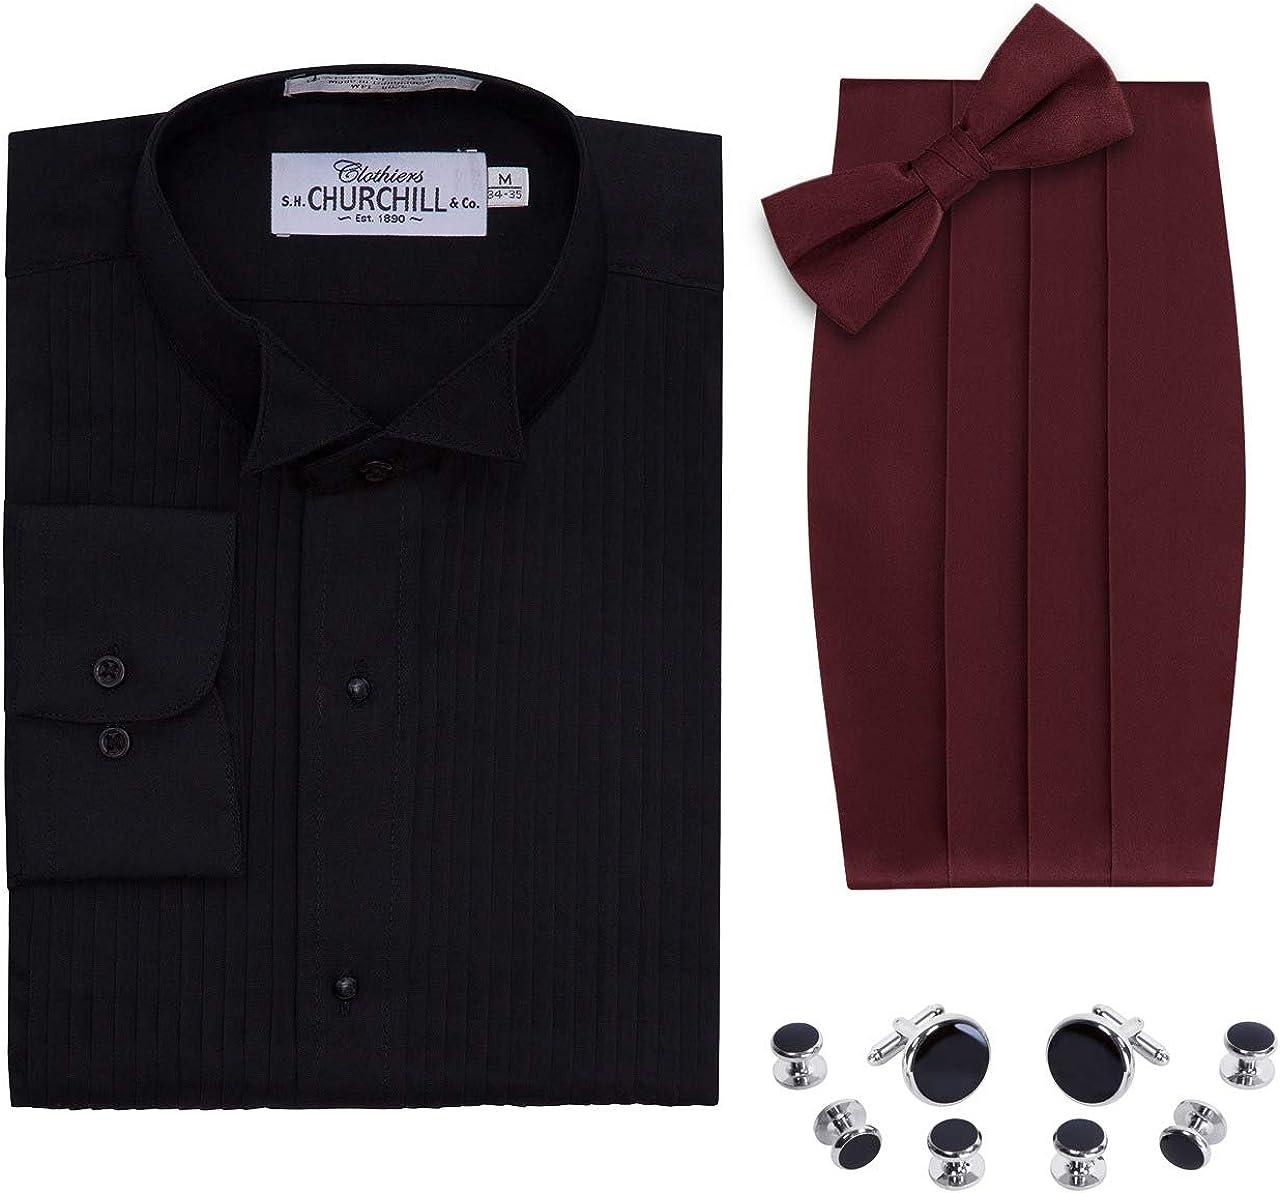 S.H. Churchill & Co. Camisa de Esmoquin para Hombre, Color Negro ...